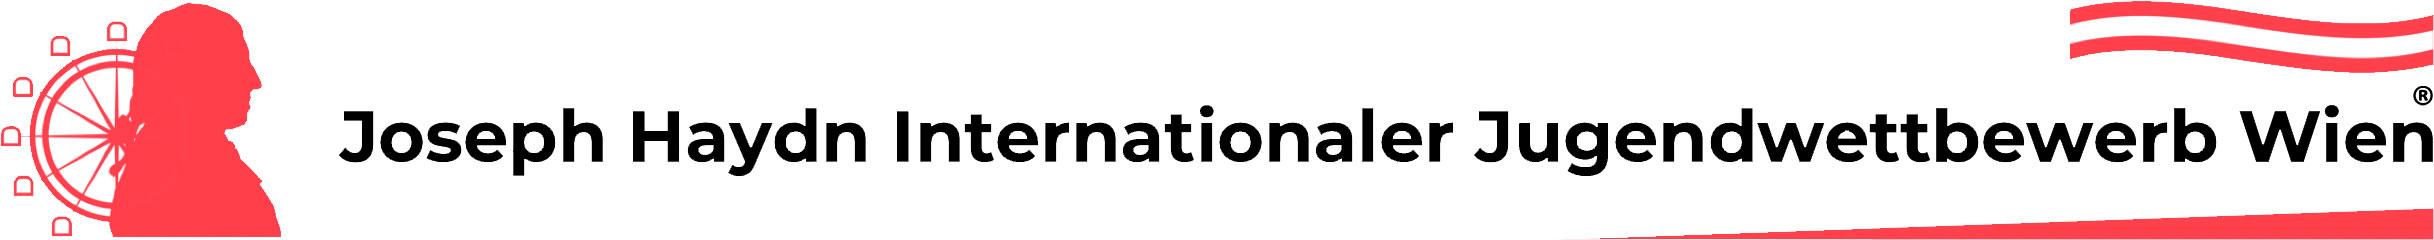 Joseph Haydn International Youth Competition